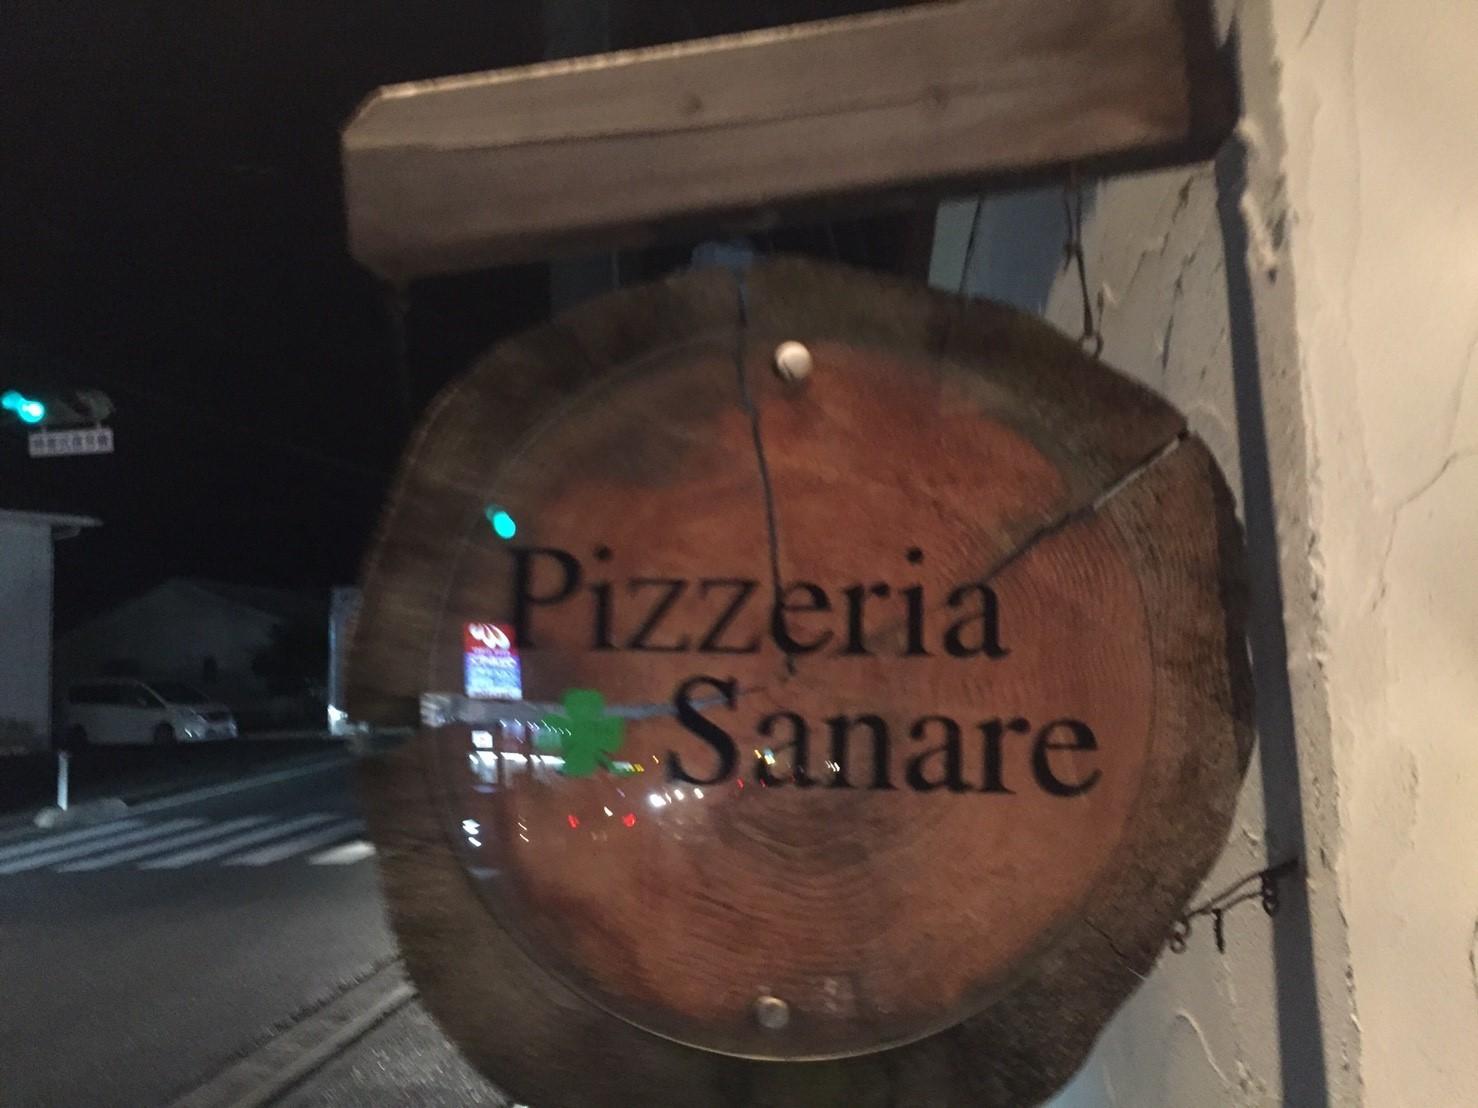 Pizzeria Sanare 取り分けディナー_e0115904_05034338.jpg